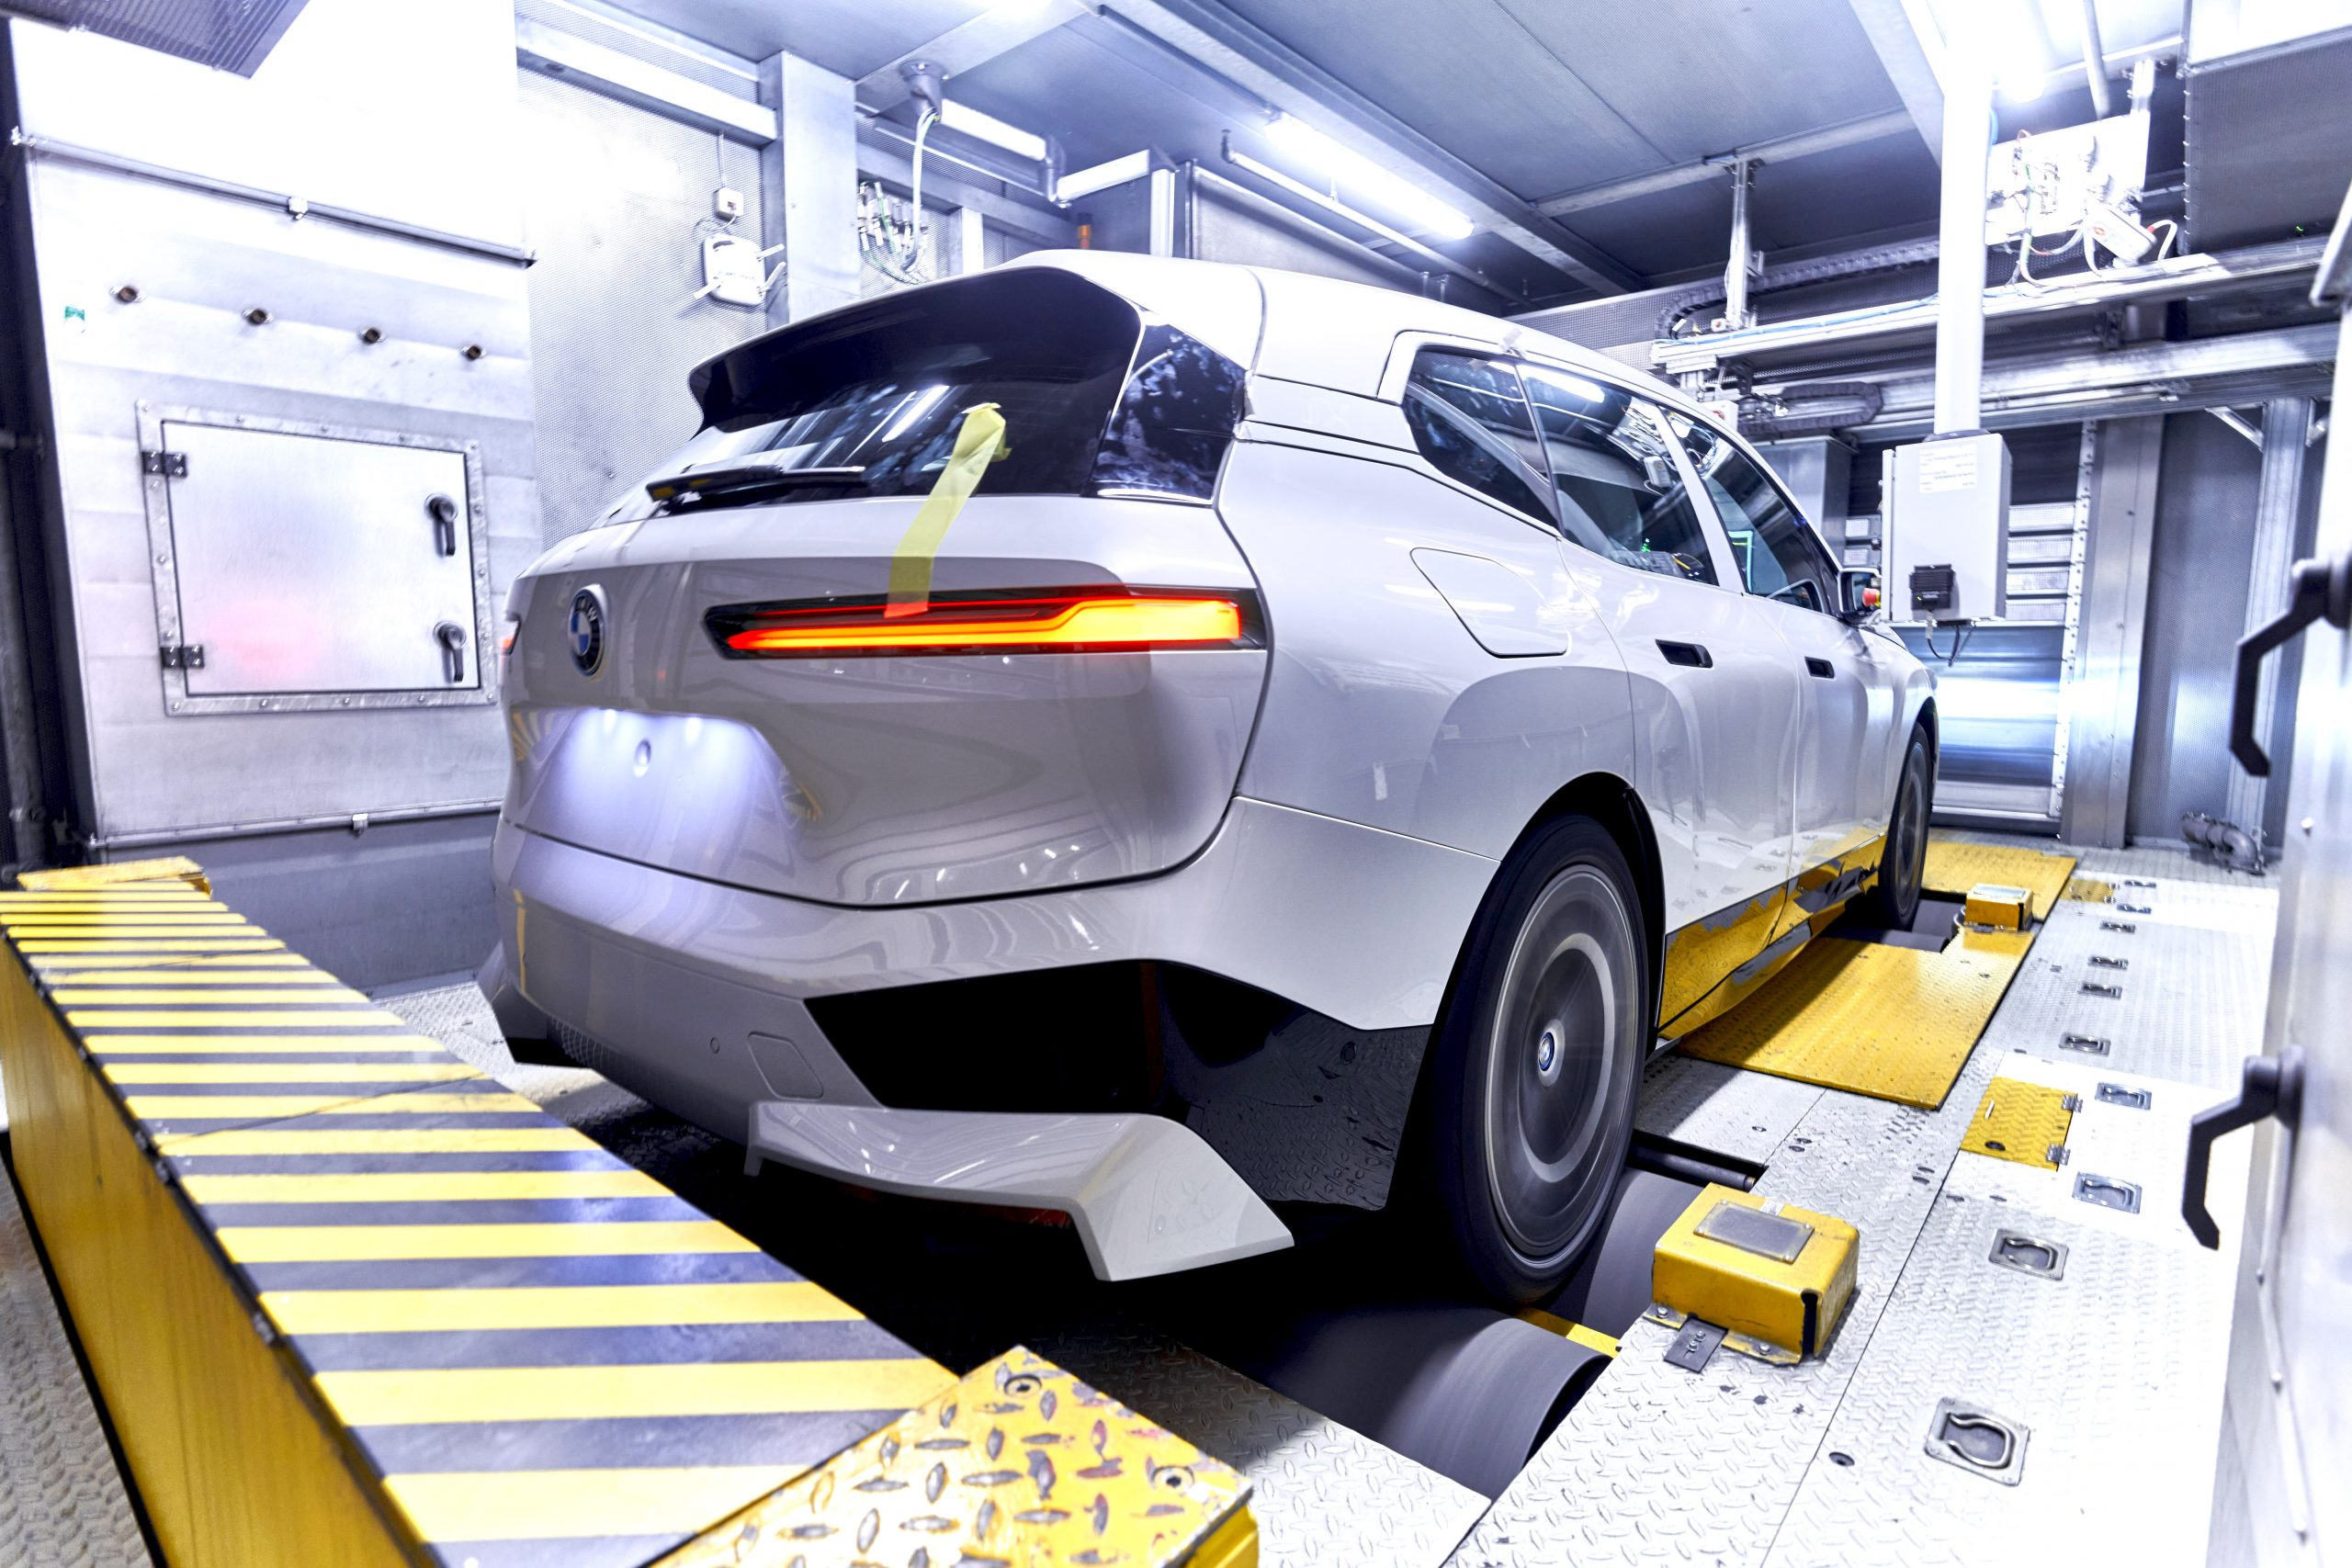 P90407623 highRes scaled Οι πρώτες BMW iX βγαίνουν από τη γραμμή παραγωγής BMW, BMW i, BMW iX, Electric cars, electric vehicles, ειδήσεις, ηλεκτρικά, ηλεκτροκινηση, Νέα